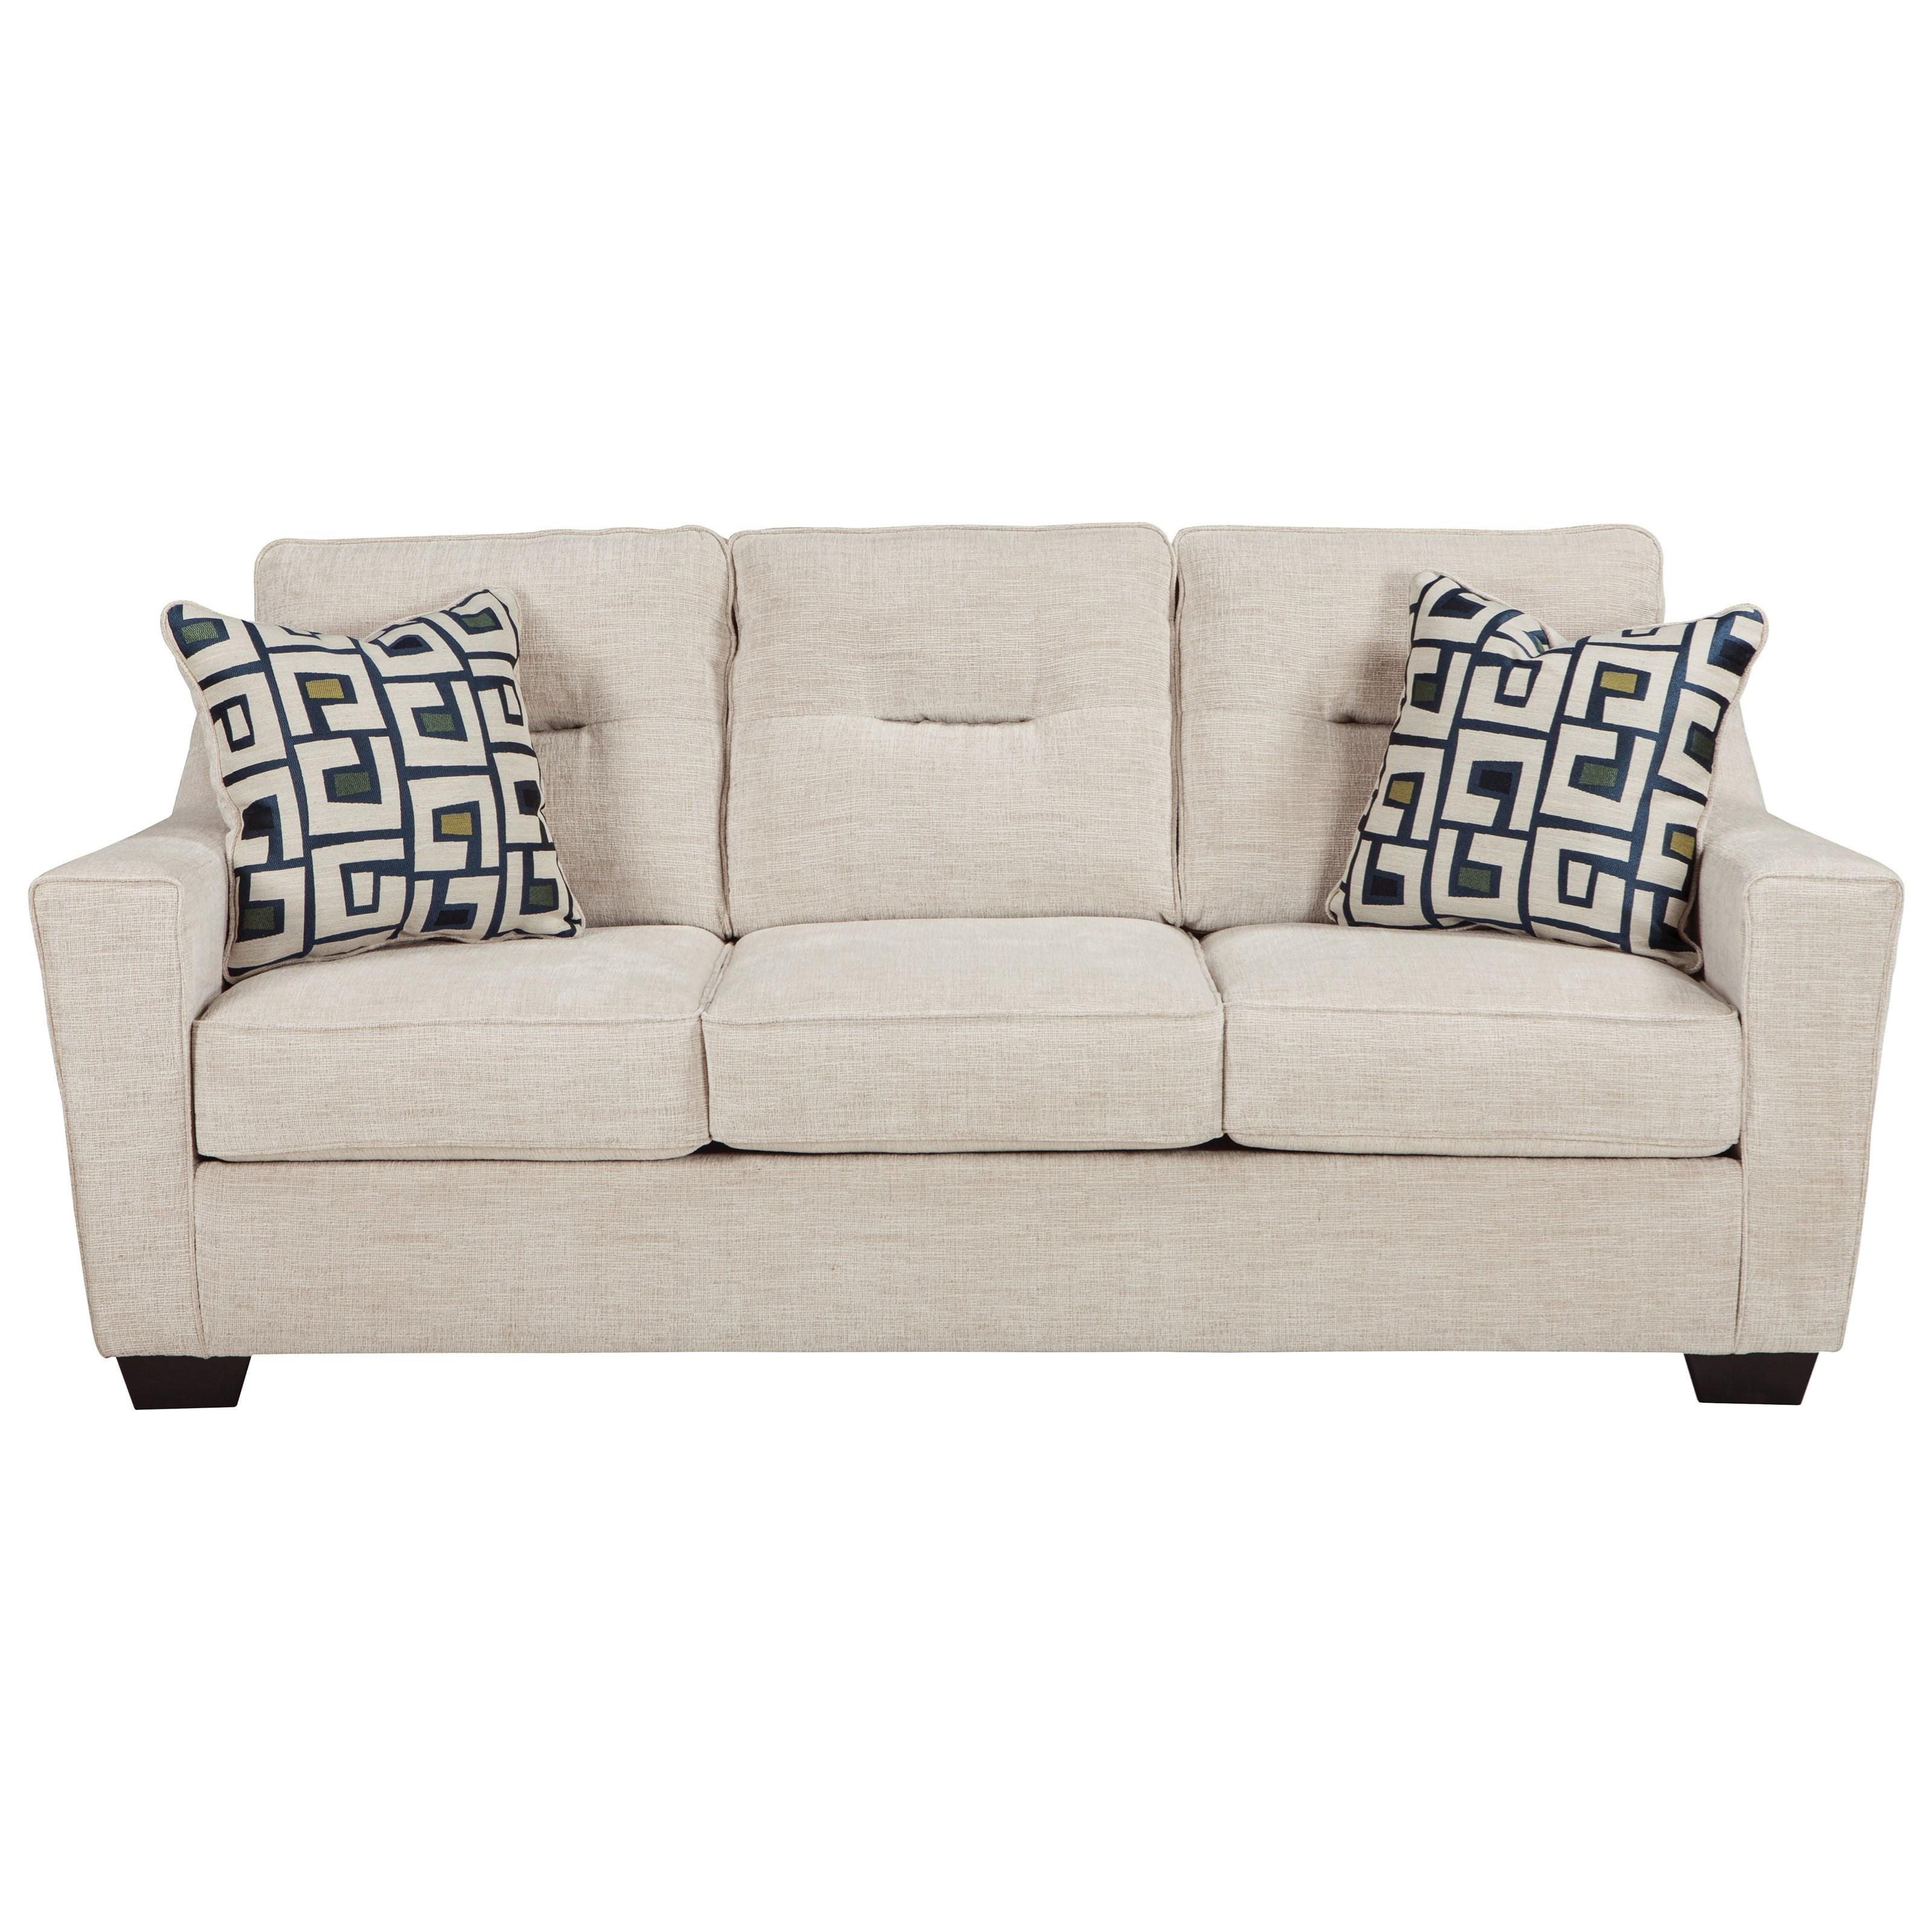 Ashley Furniture Cerdic Contemporary Queen Sofa Sleeper